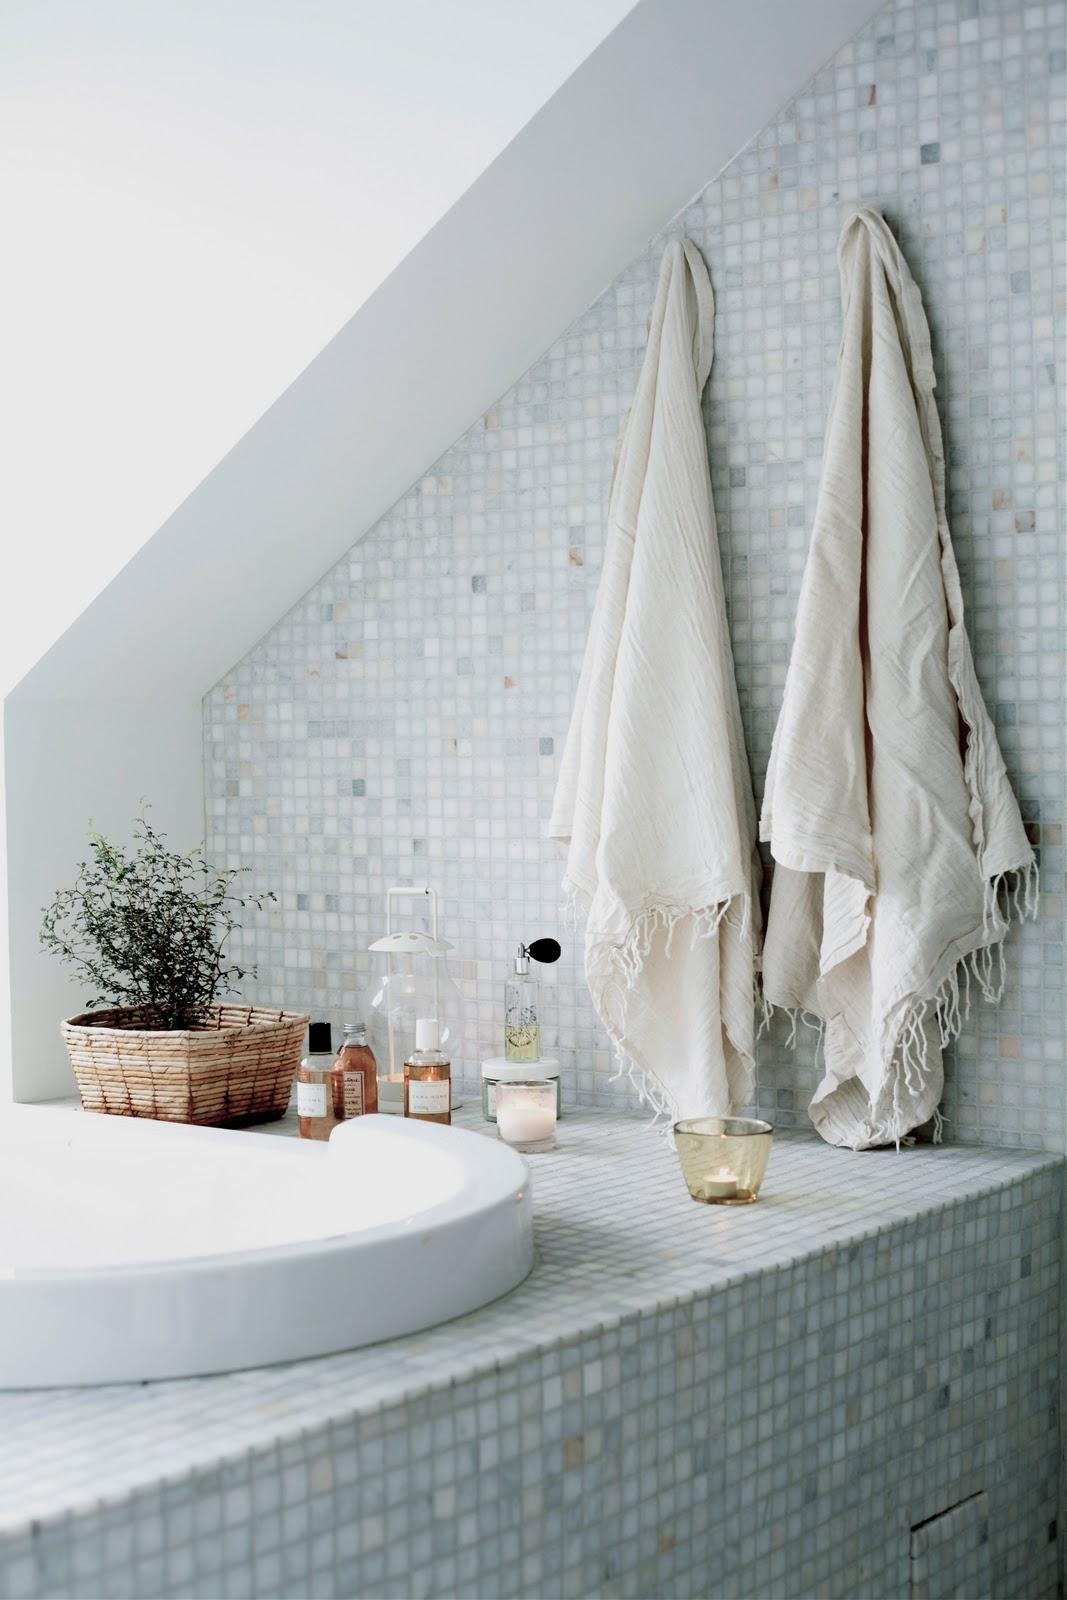 Daniella witte: harmoniskt i badrummet!